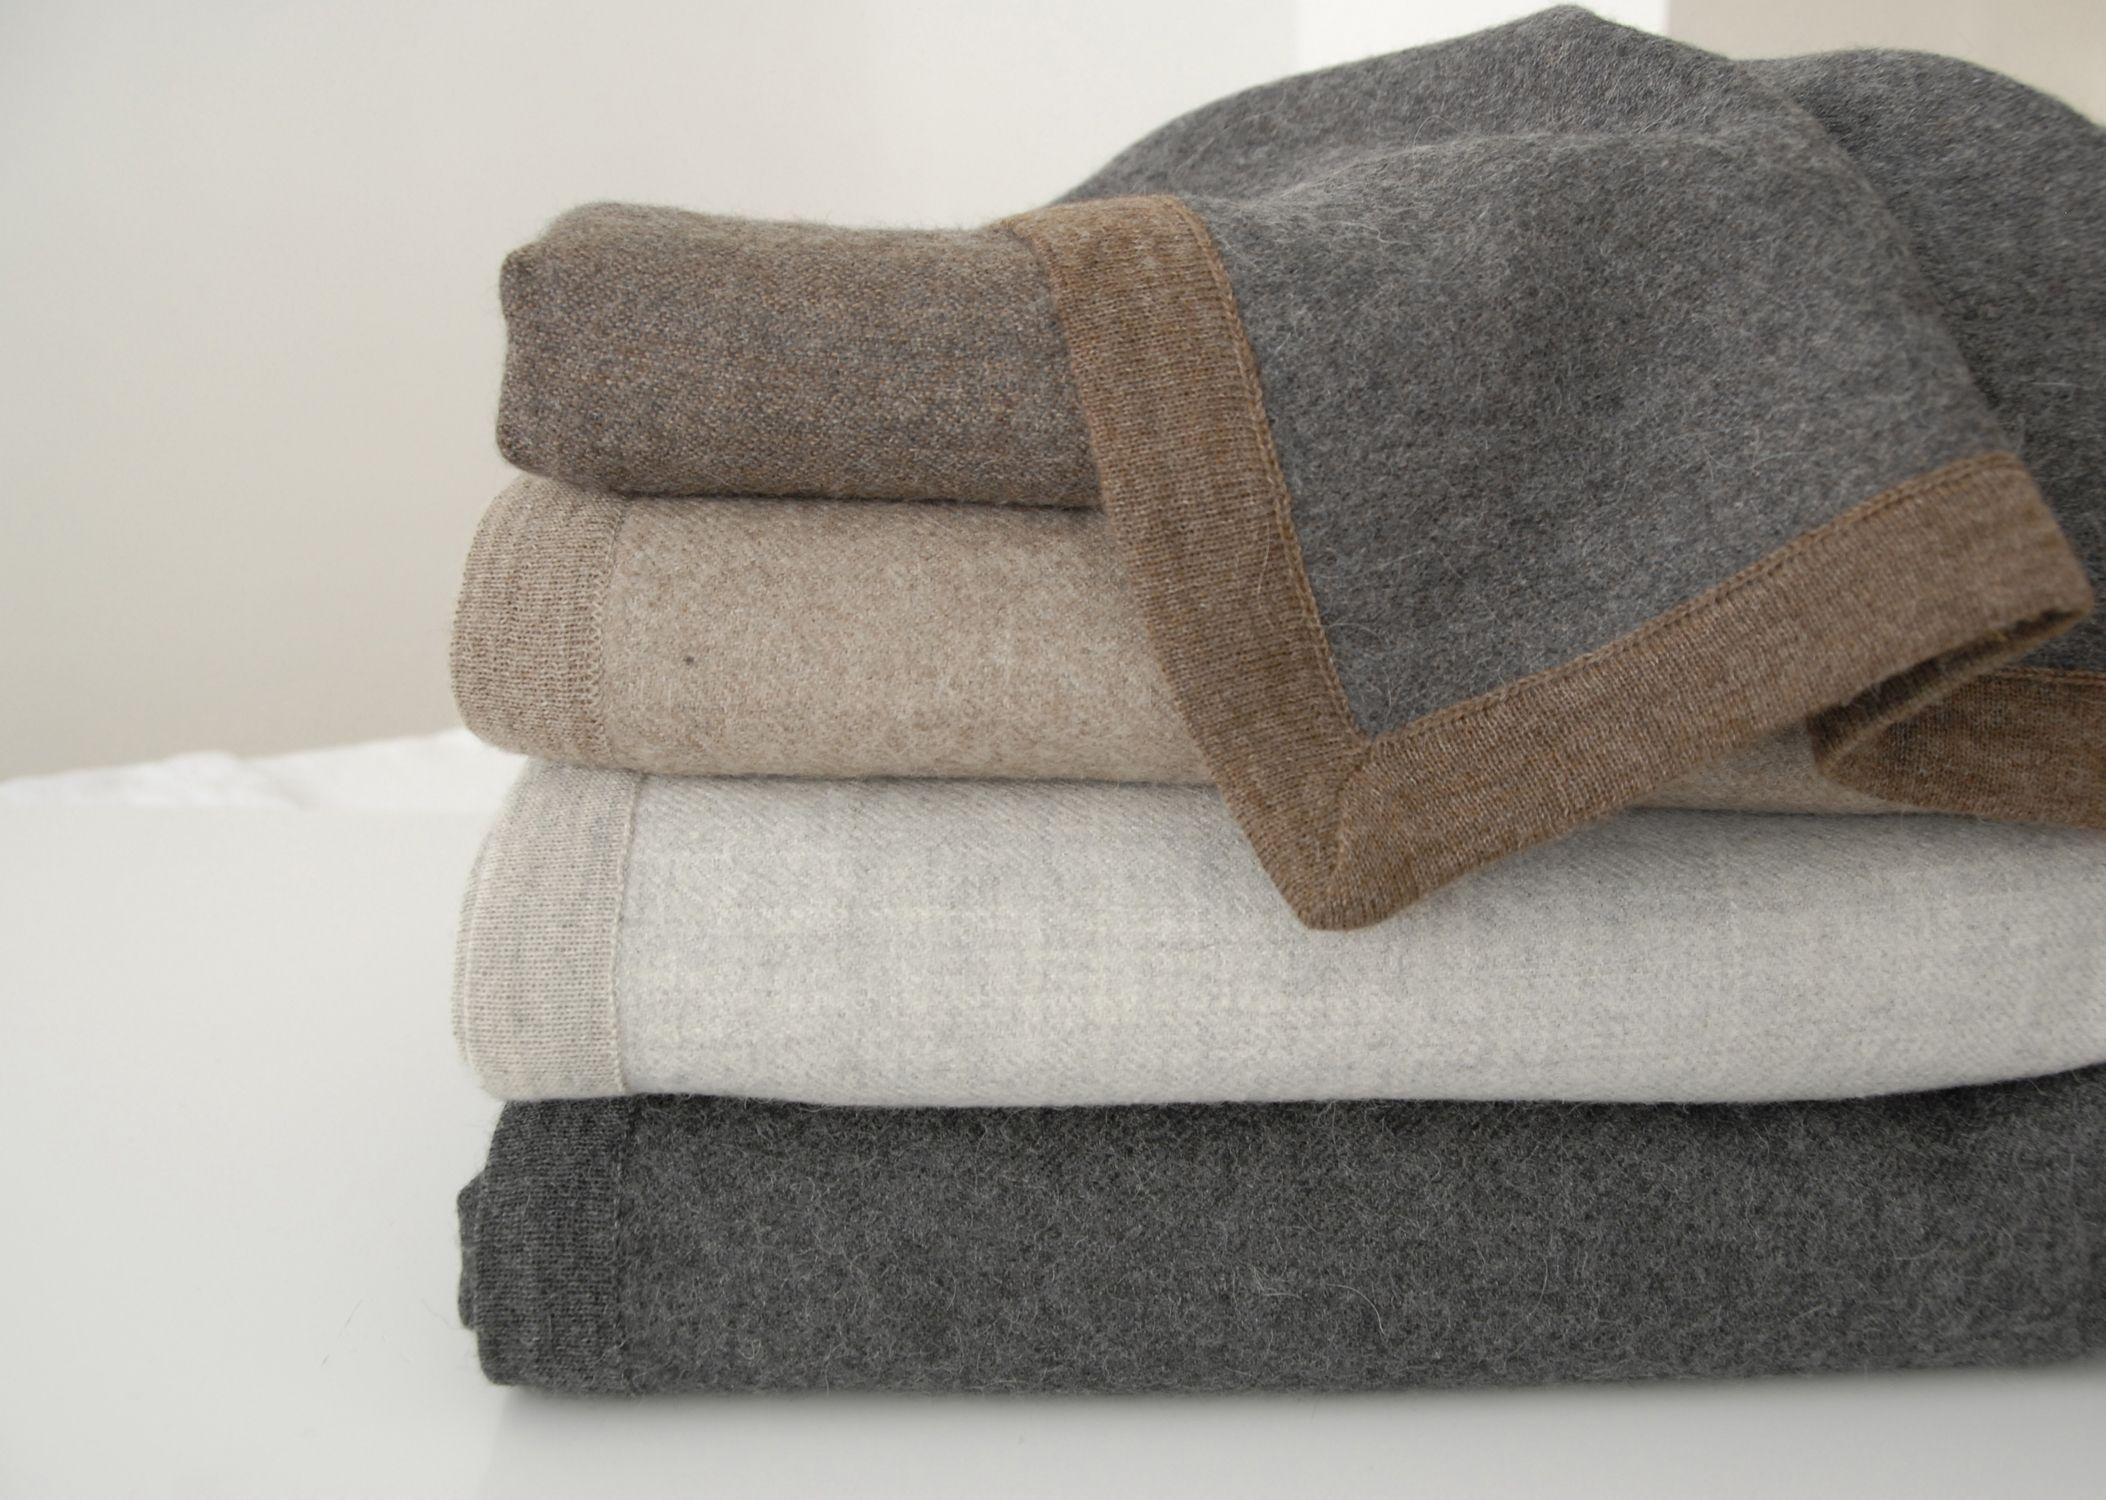 Area Bedding Liam Blanket Modern Planet Pretty Blankets Textured Blankets Blanket